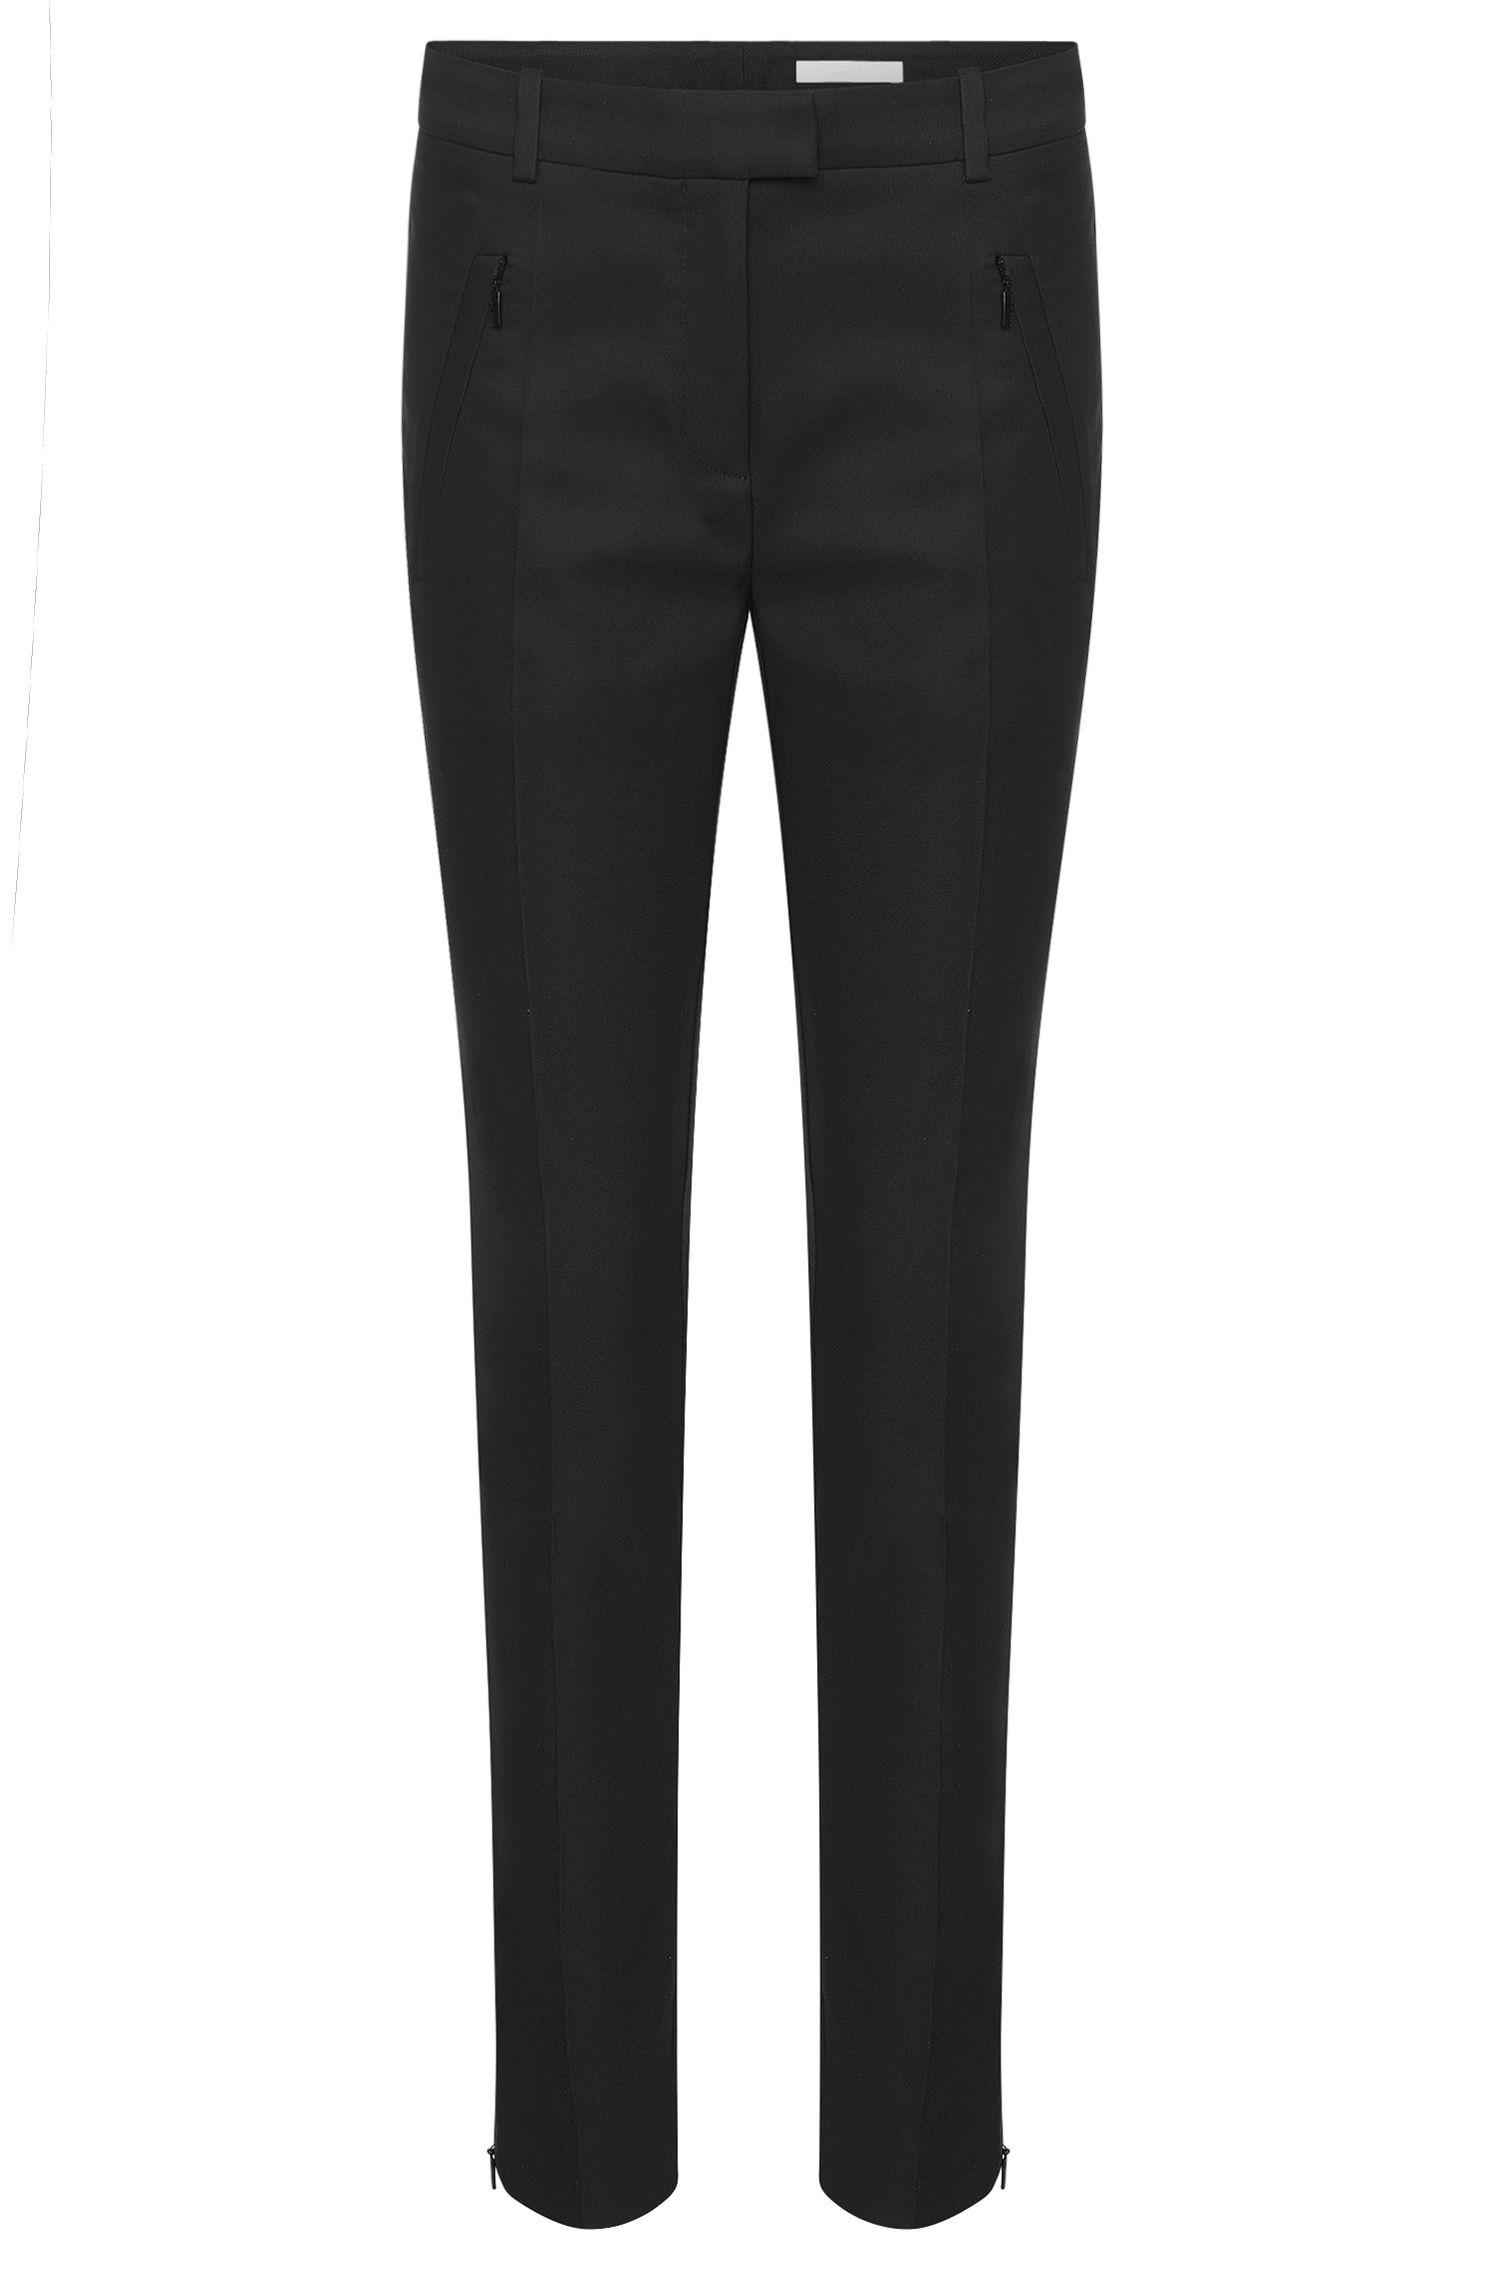 'Anaita' | Stretch Cotton Zip Pocket Trousers